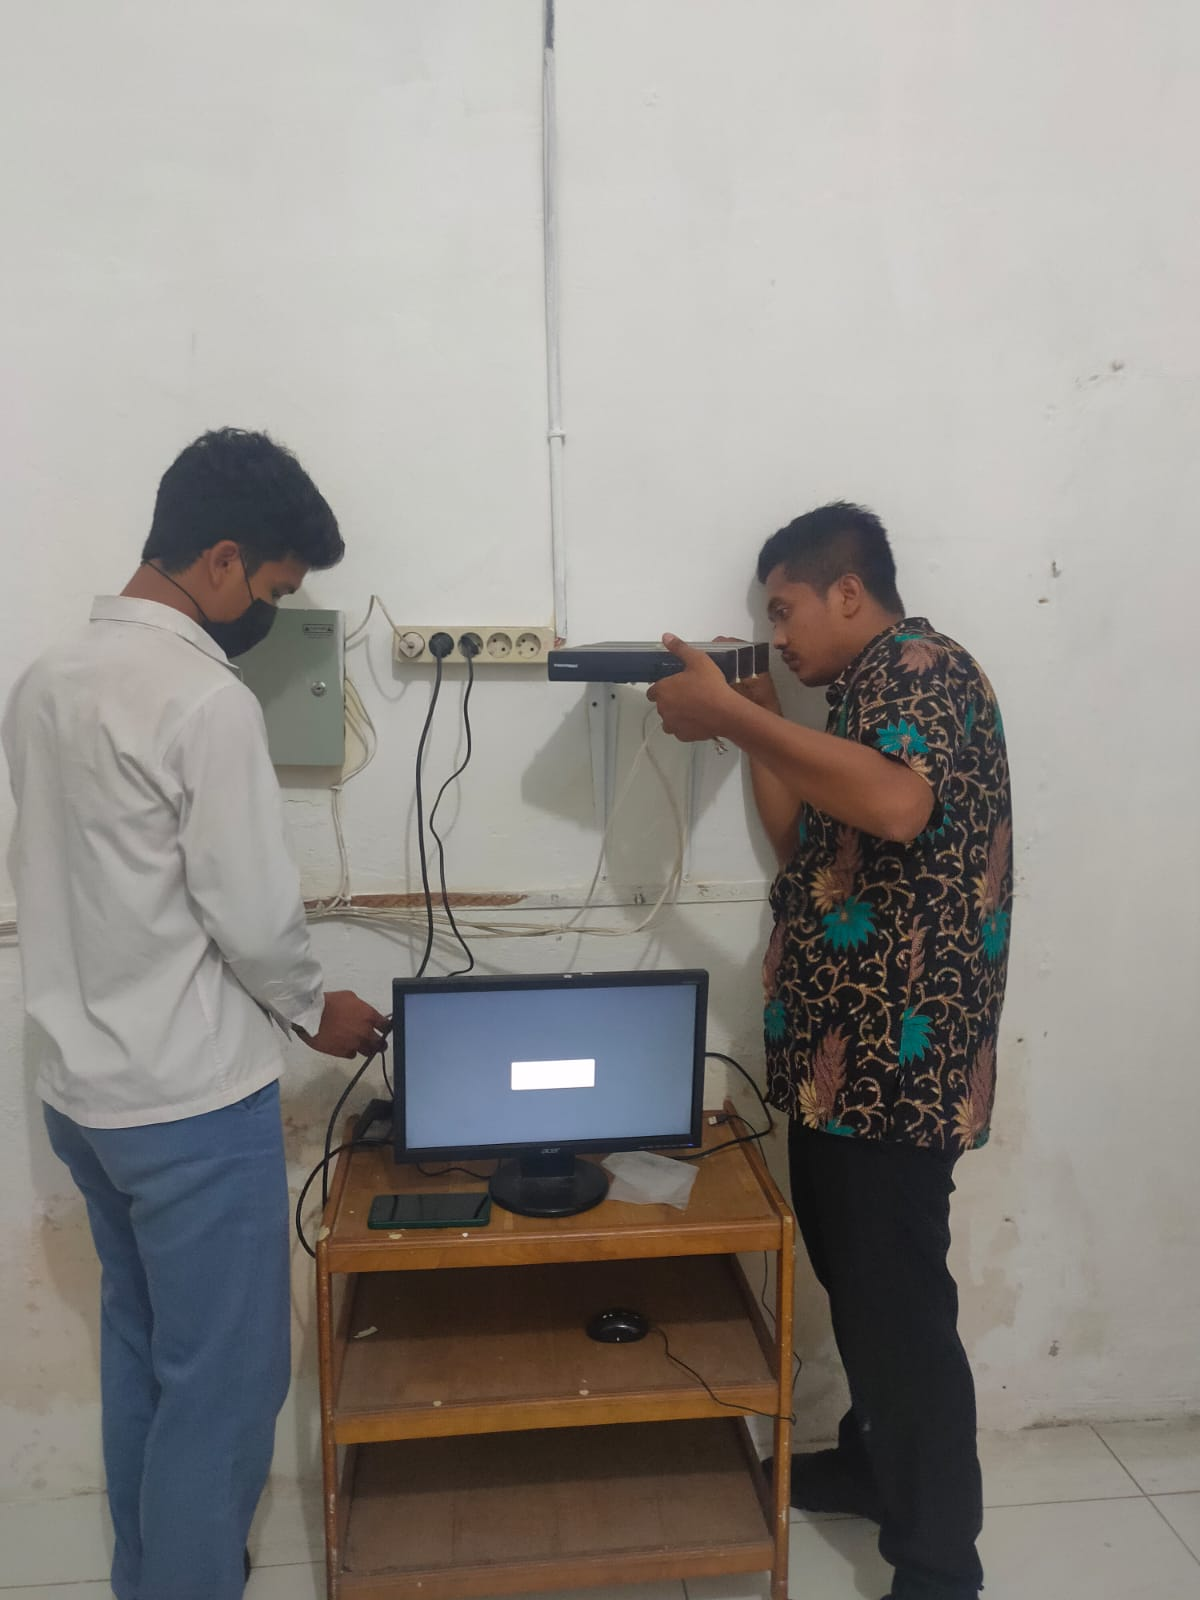 PENGGANTIAN CCTV DAN MONITORING JARINGAN DI KECAMATAN BANDAR PASIR MANDOGE